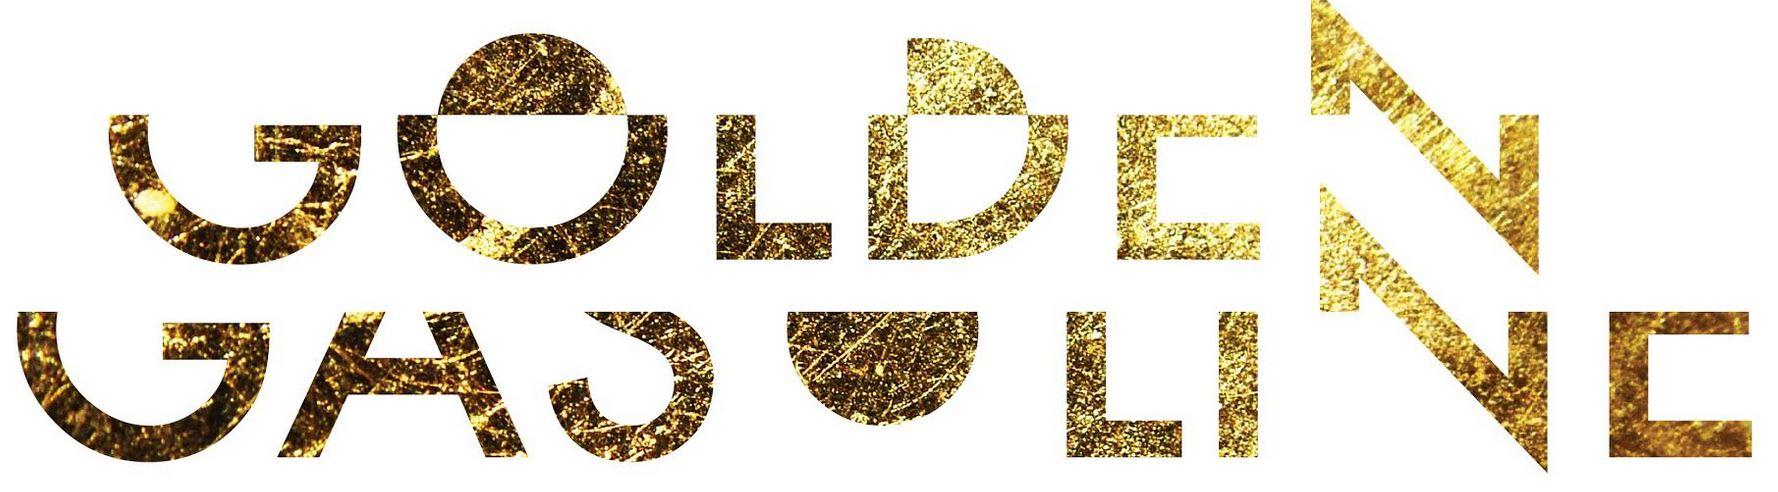 golden gasoline 03